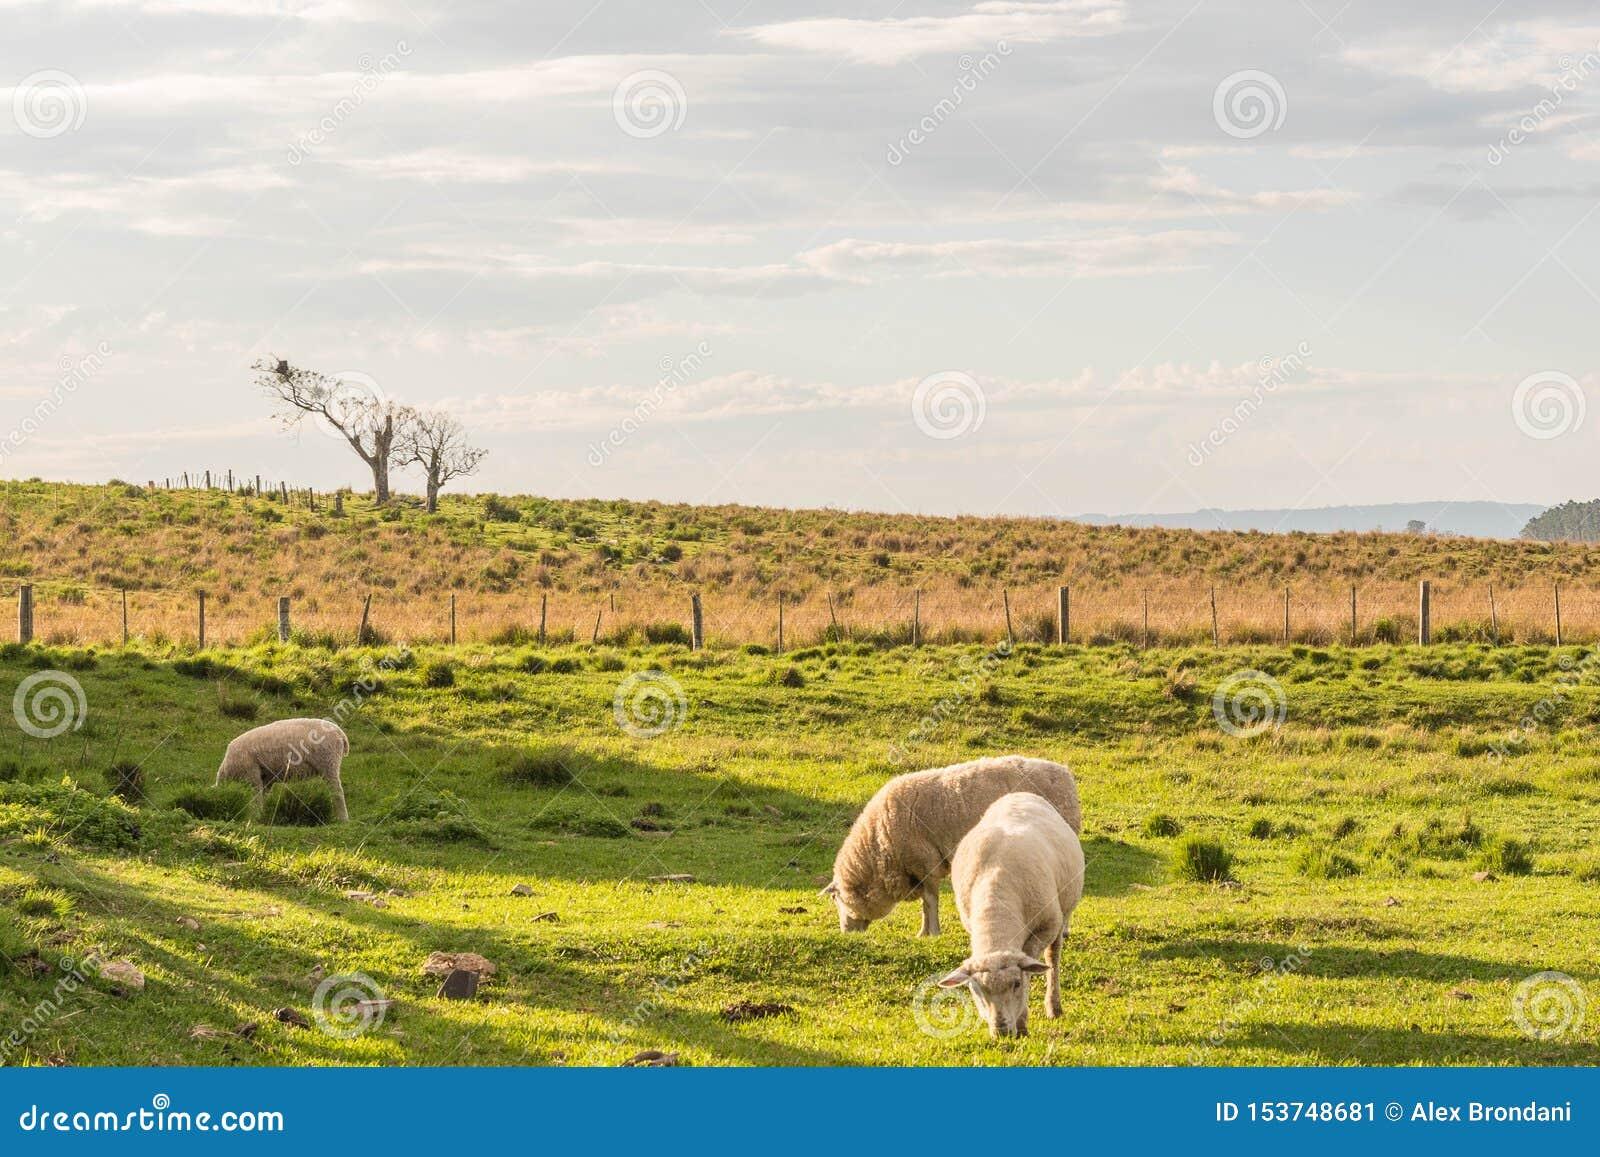 Sheep Grazin in the southern Brazil 03